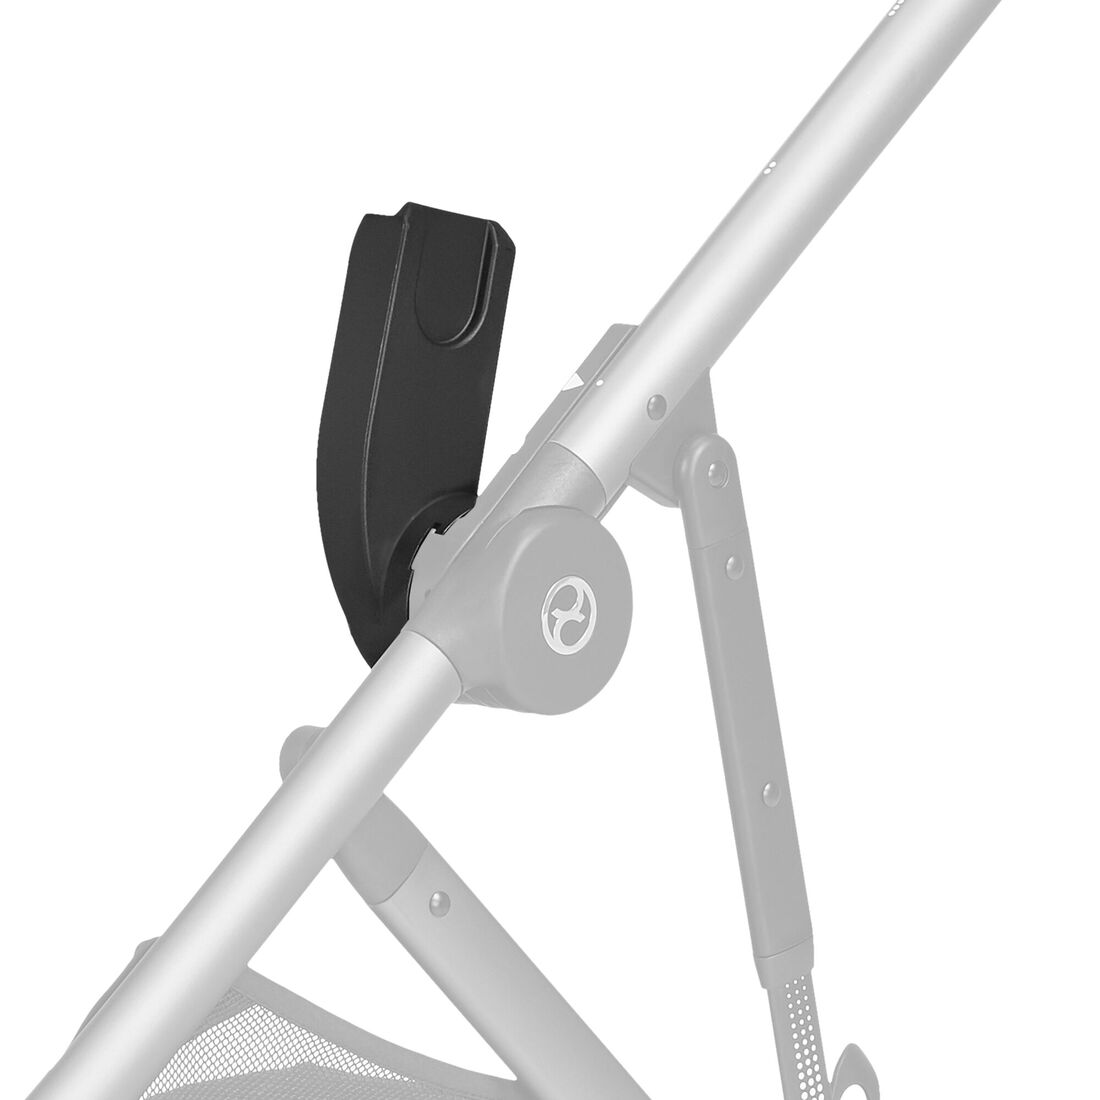 CYBEX Babyschalen Adapter Gazelle S - Black in Black large Bild 2